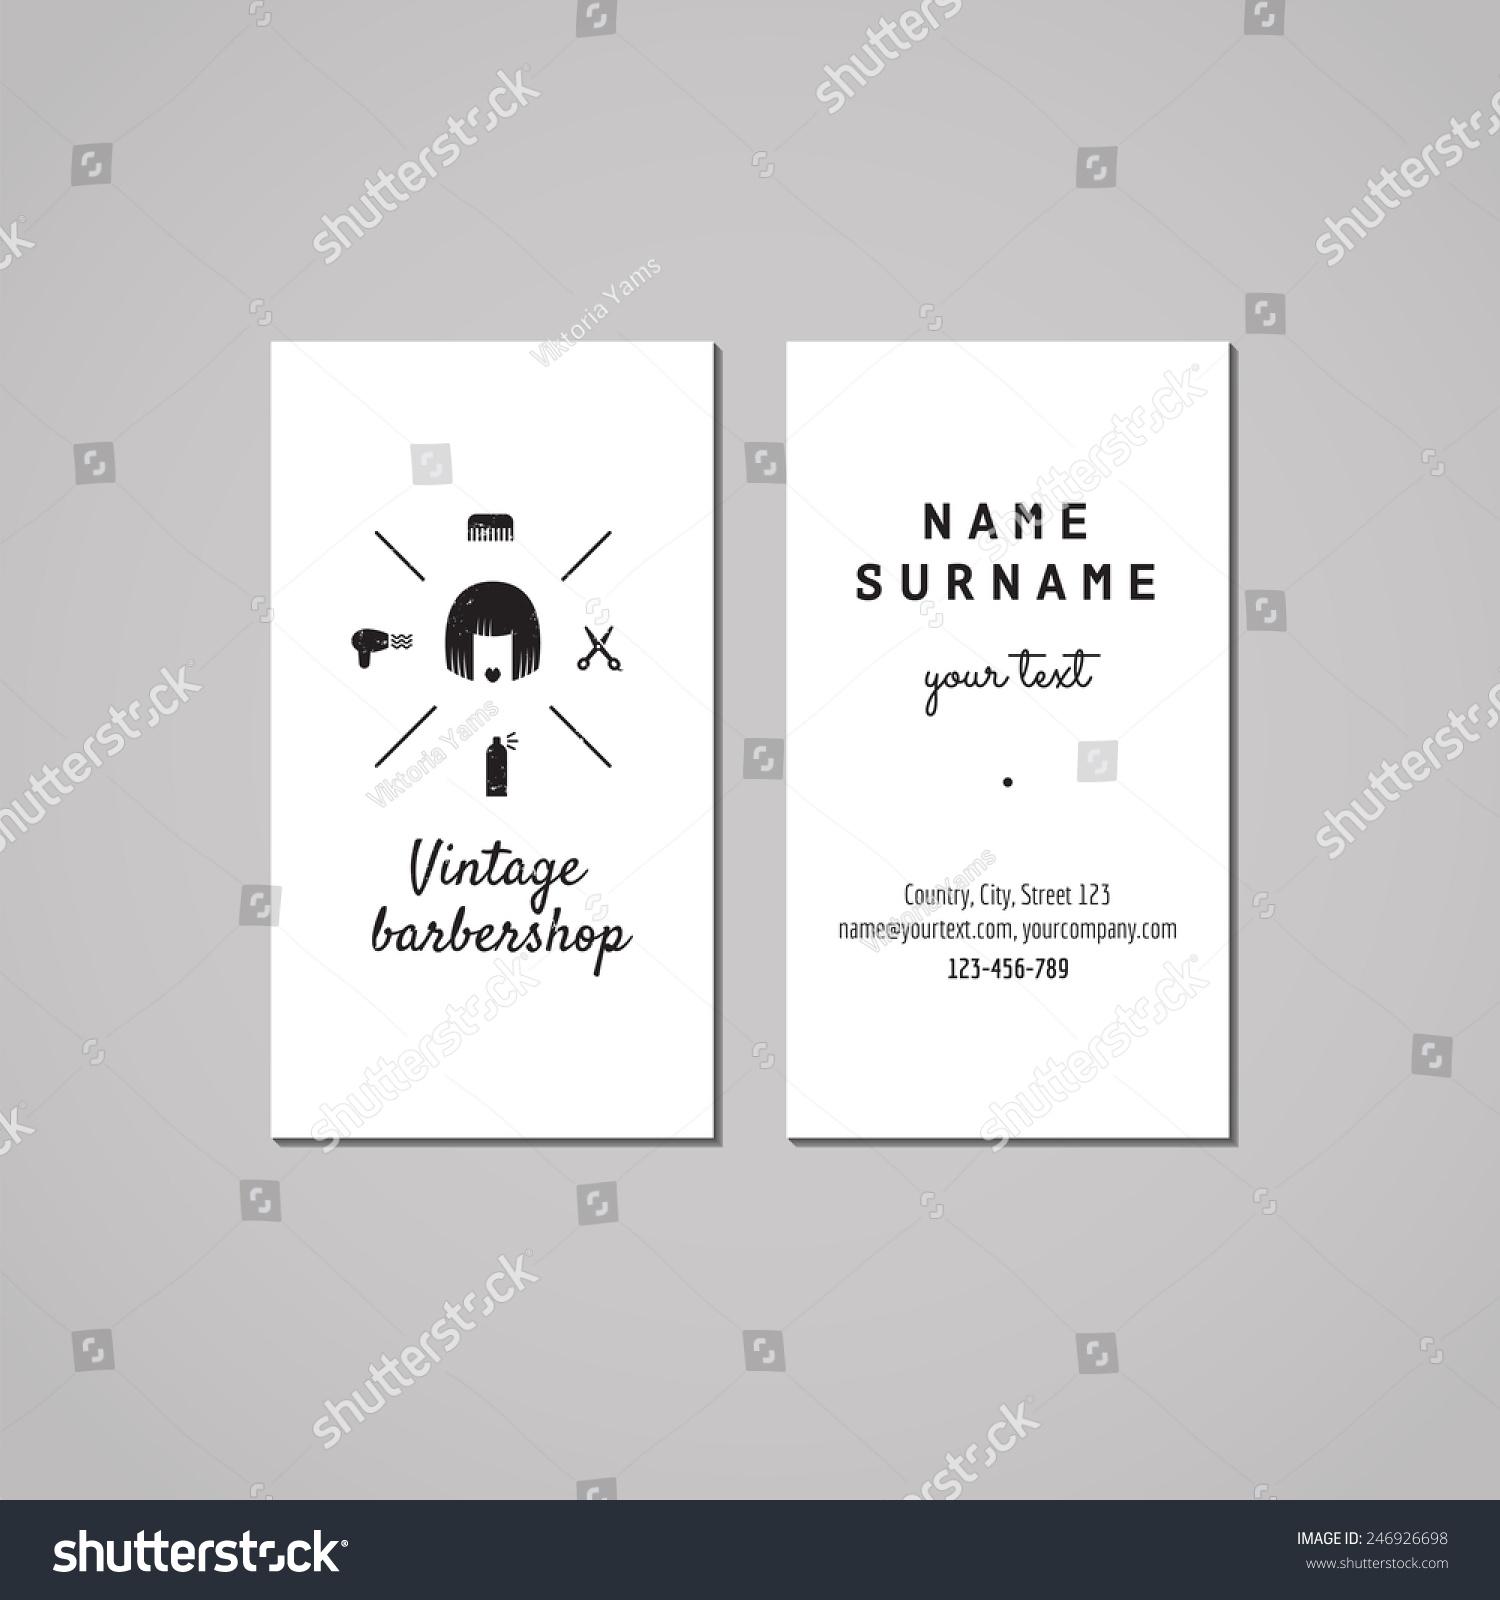 Barbershop Hair Salon Business Card Design Stock Vector 246926698 ...